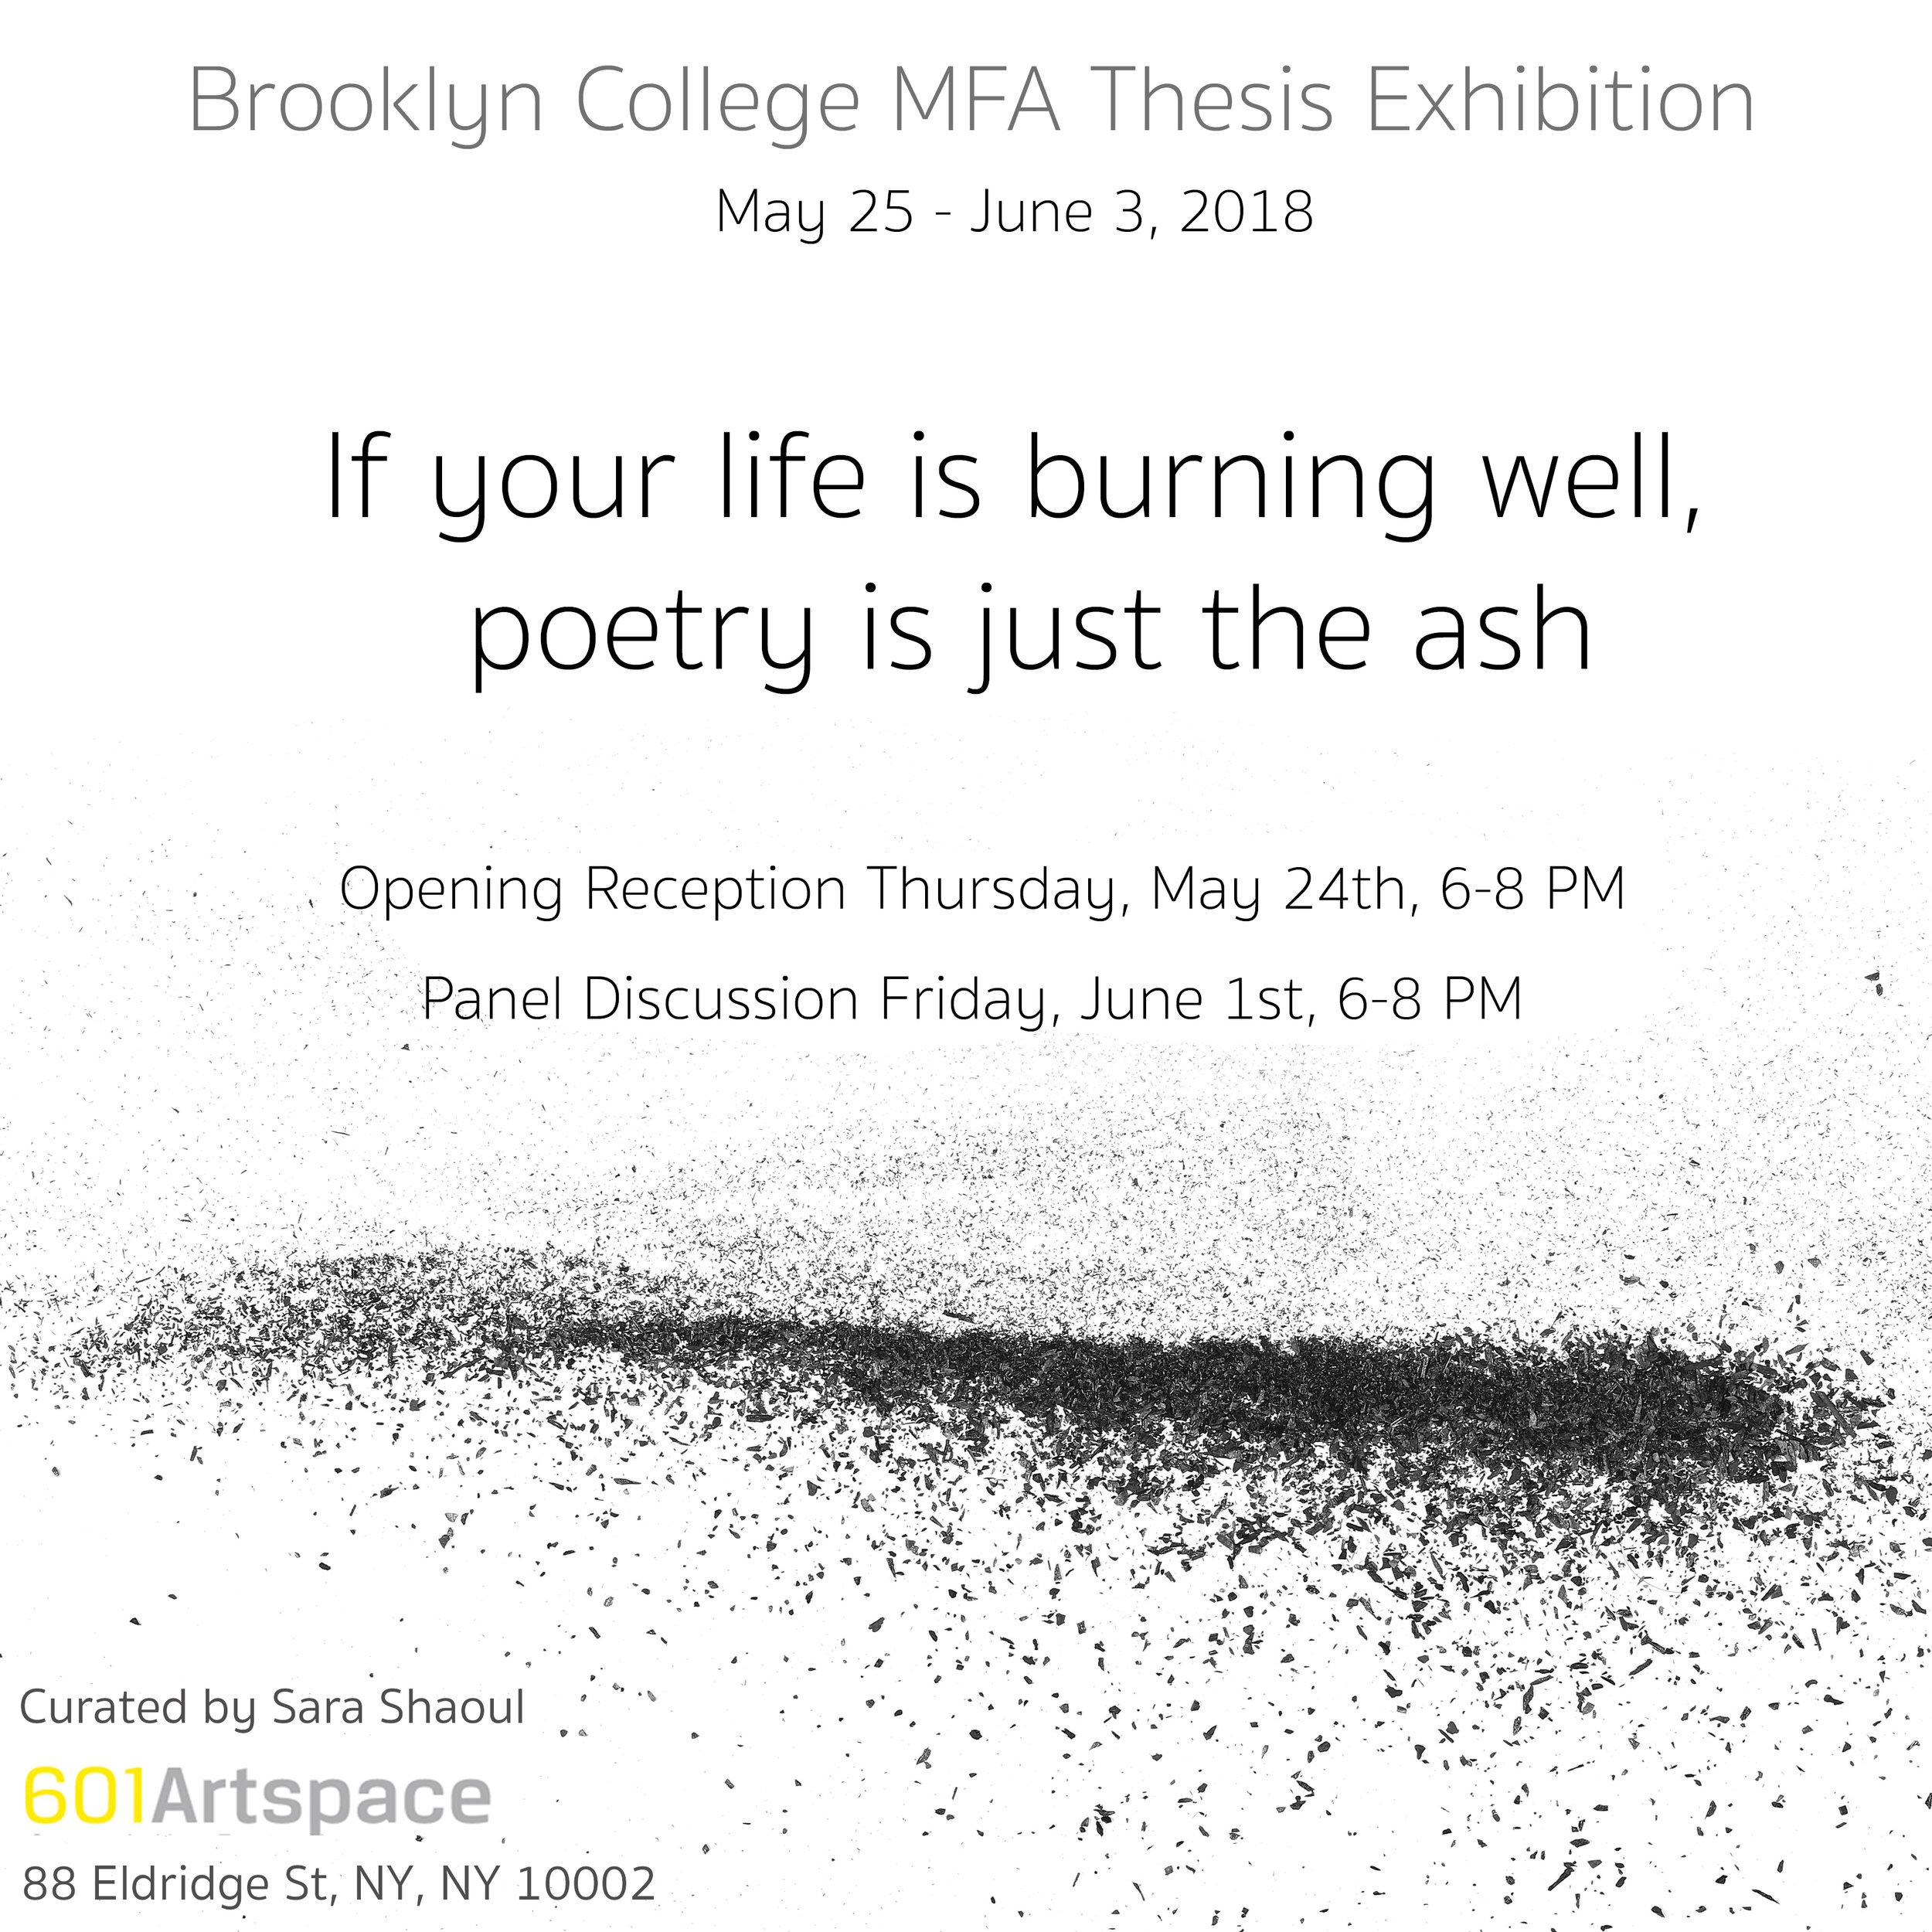 Brooklyn College MFA Thesis Exhibition 2.jpg